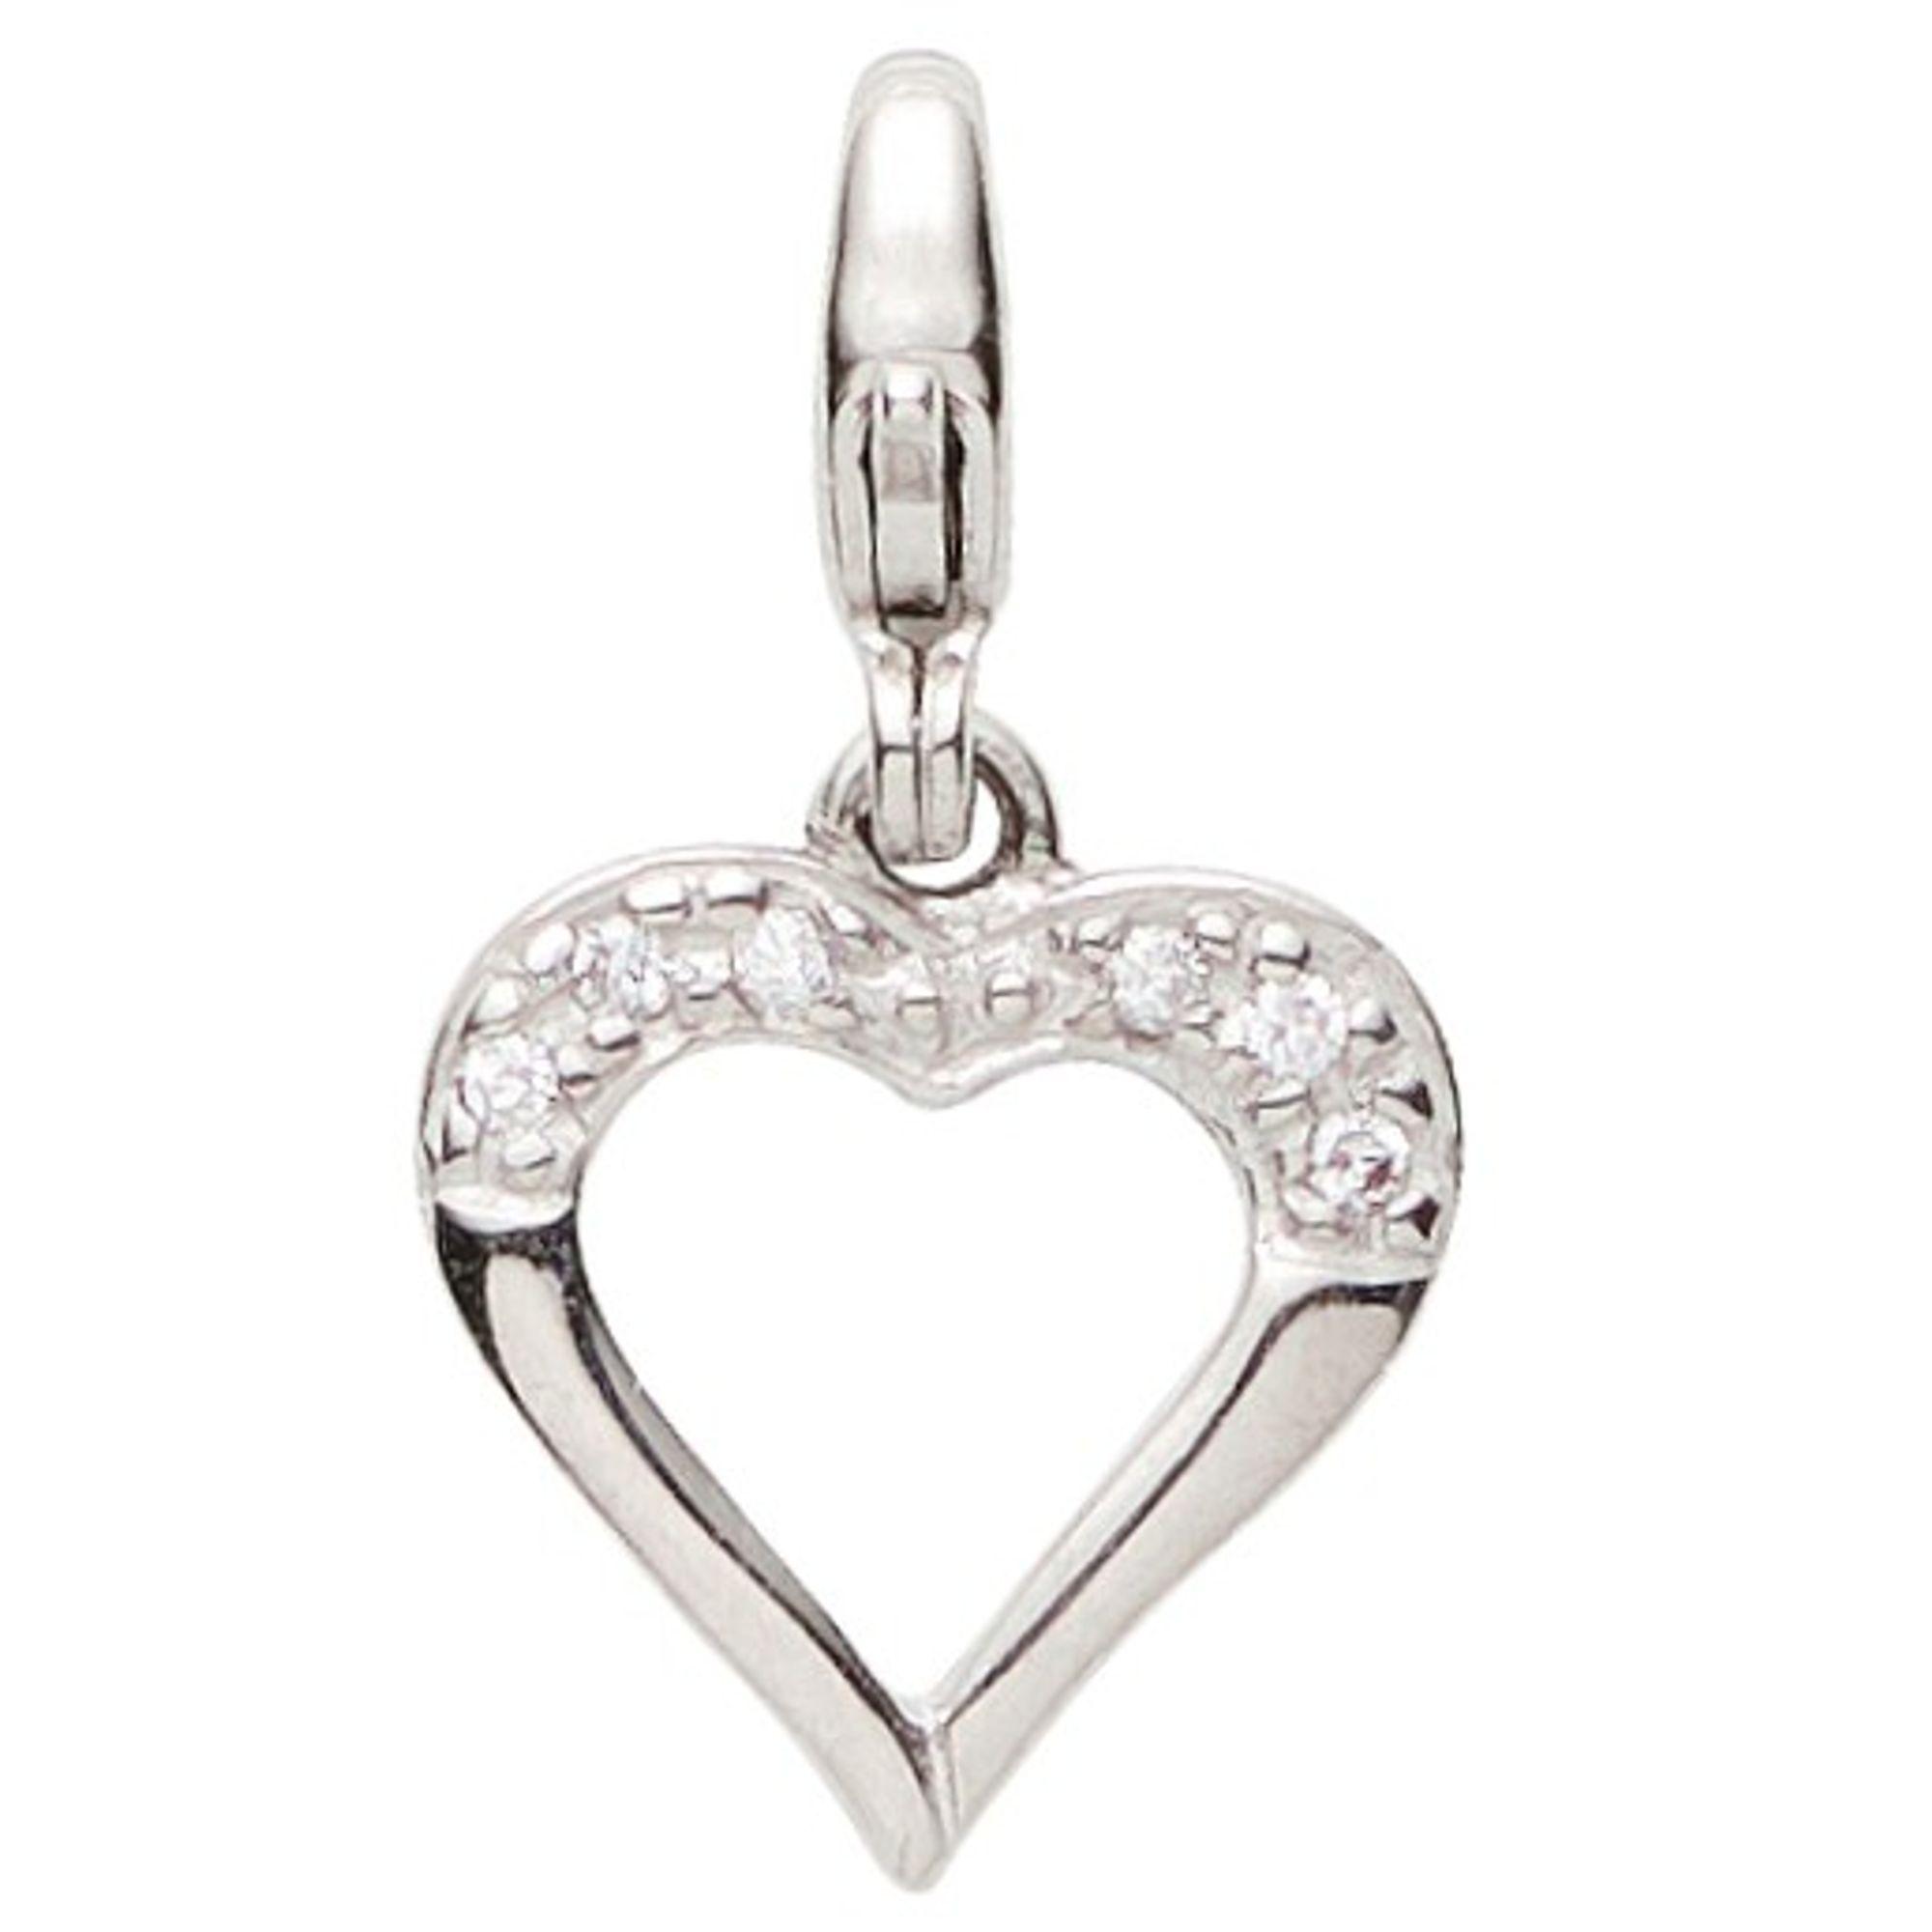 Basic Silber 22.VX433 Damen Charms Herz Silber Zirkonia weiß